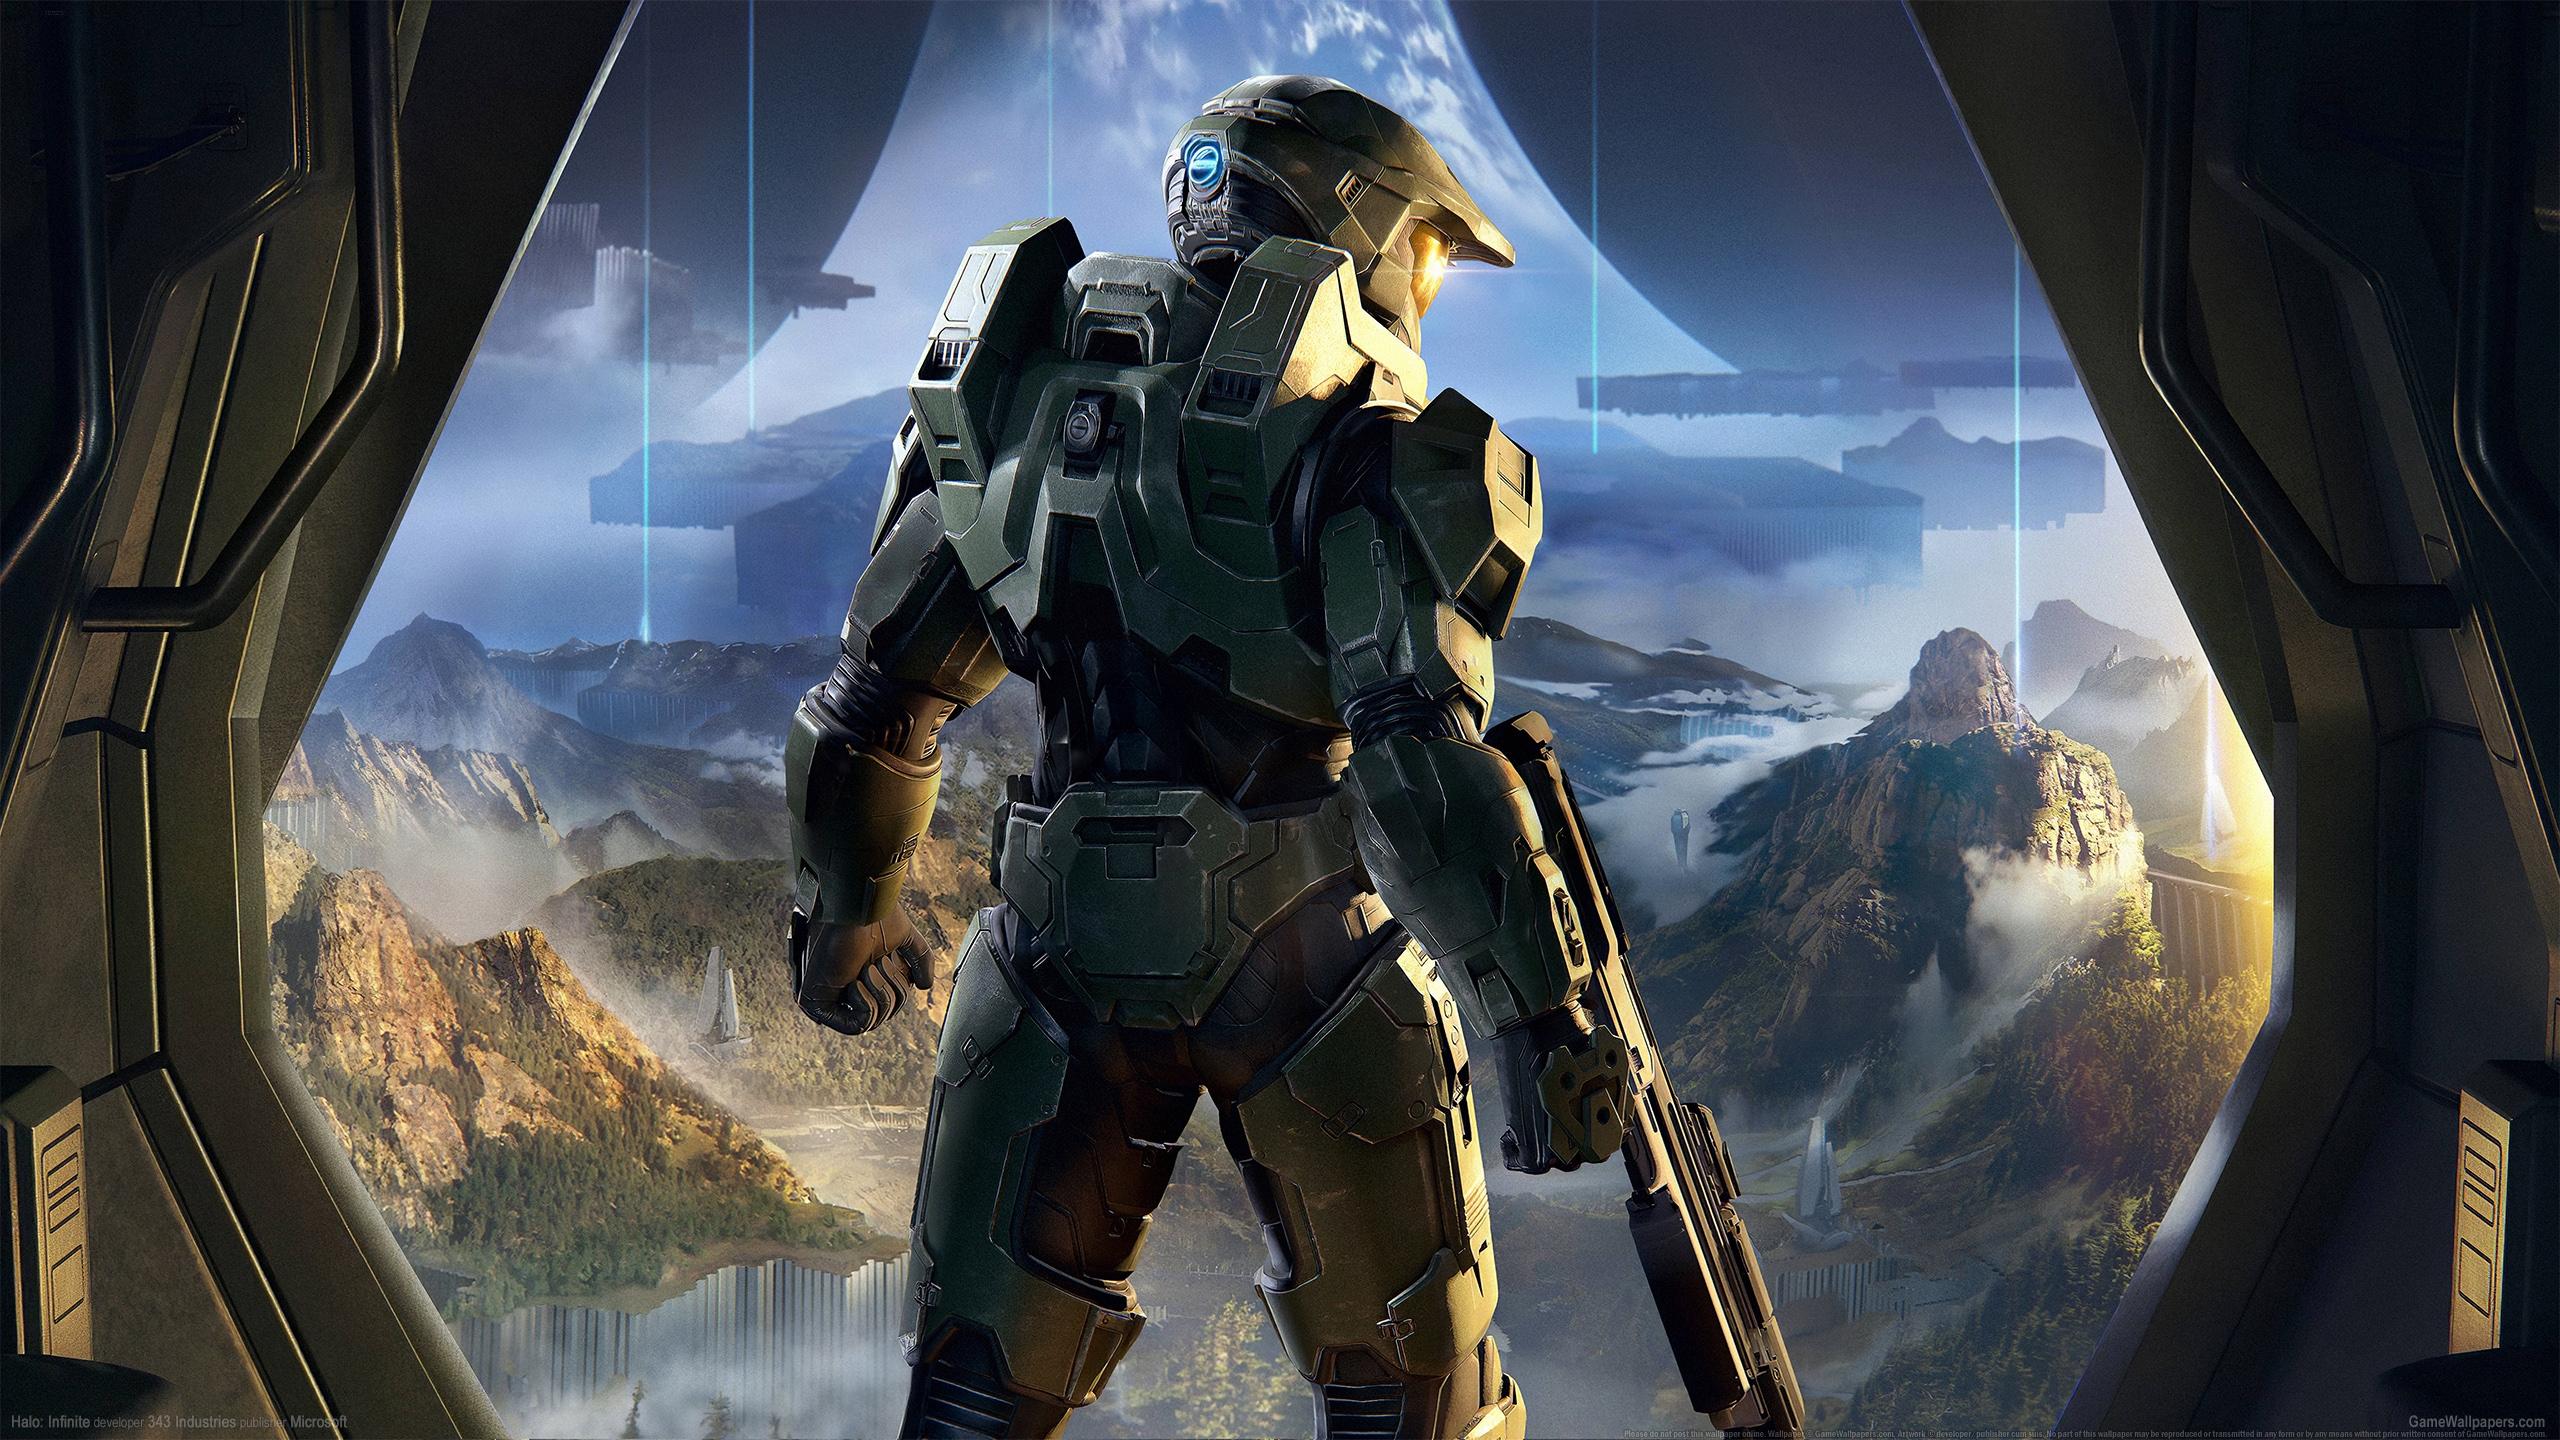 Halo: Infinite 2560x1440 Hintergrundbild 02